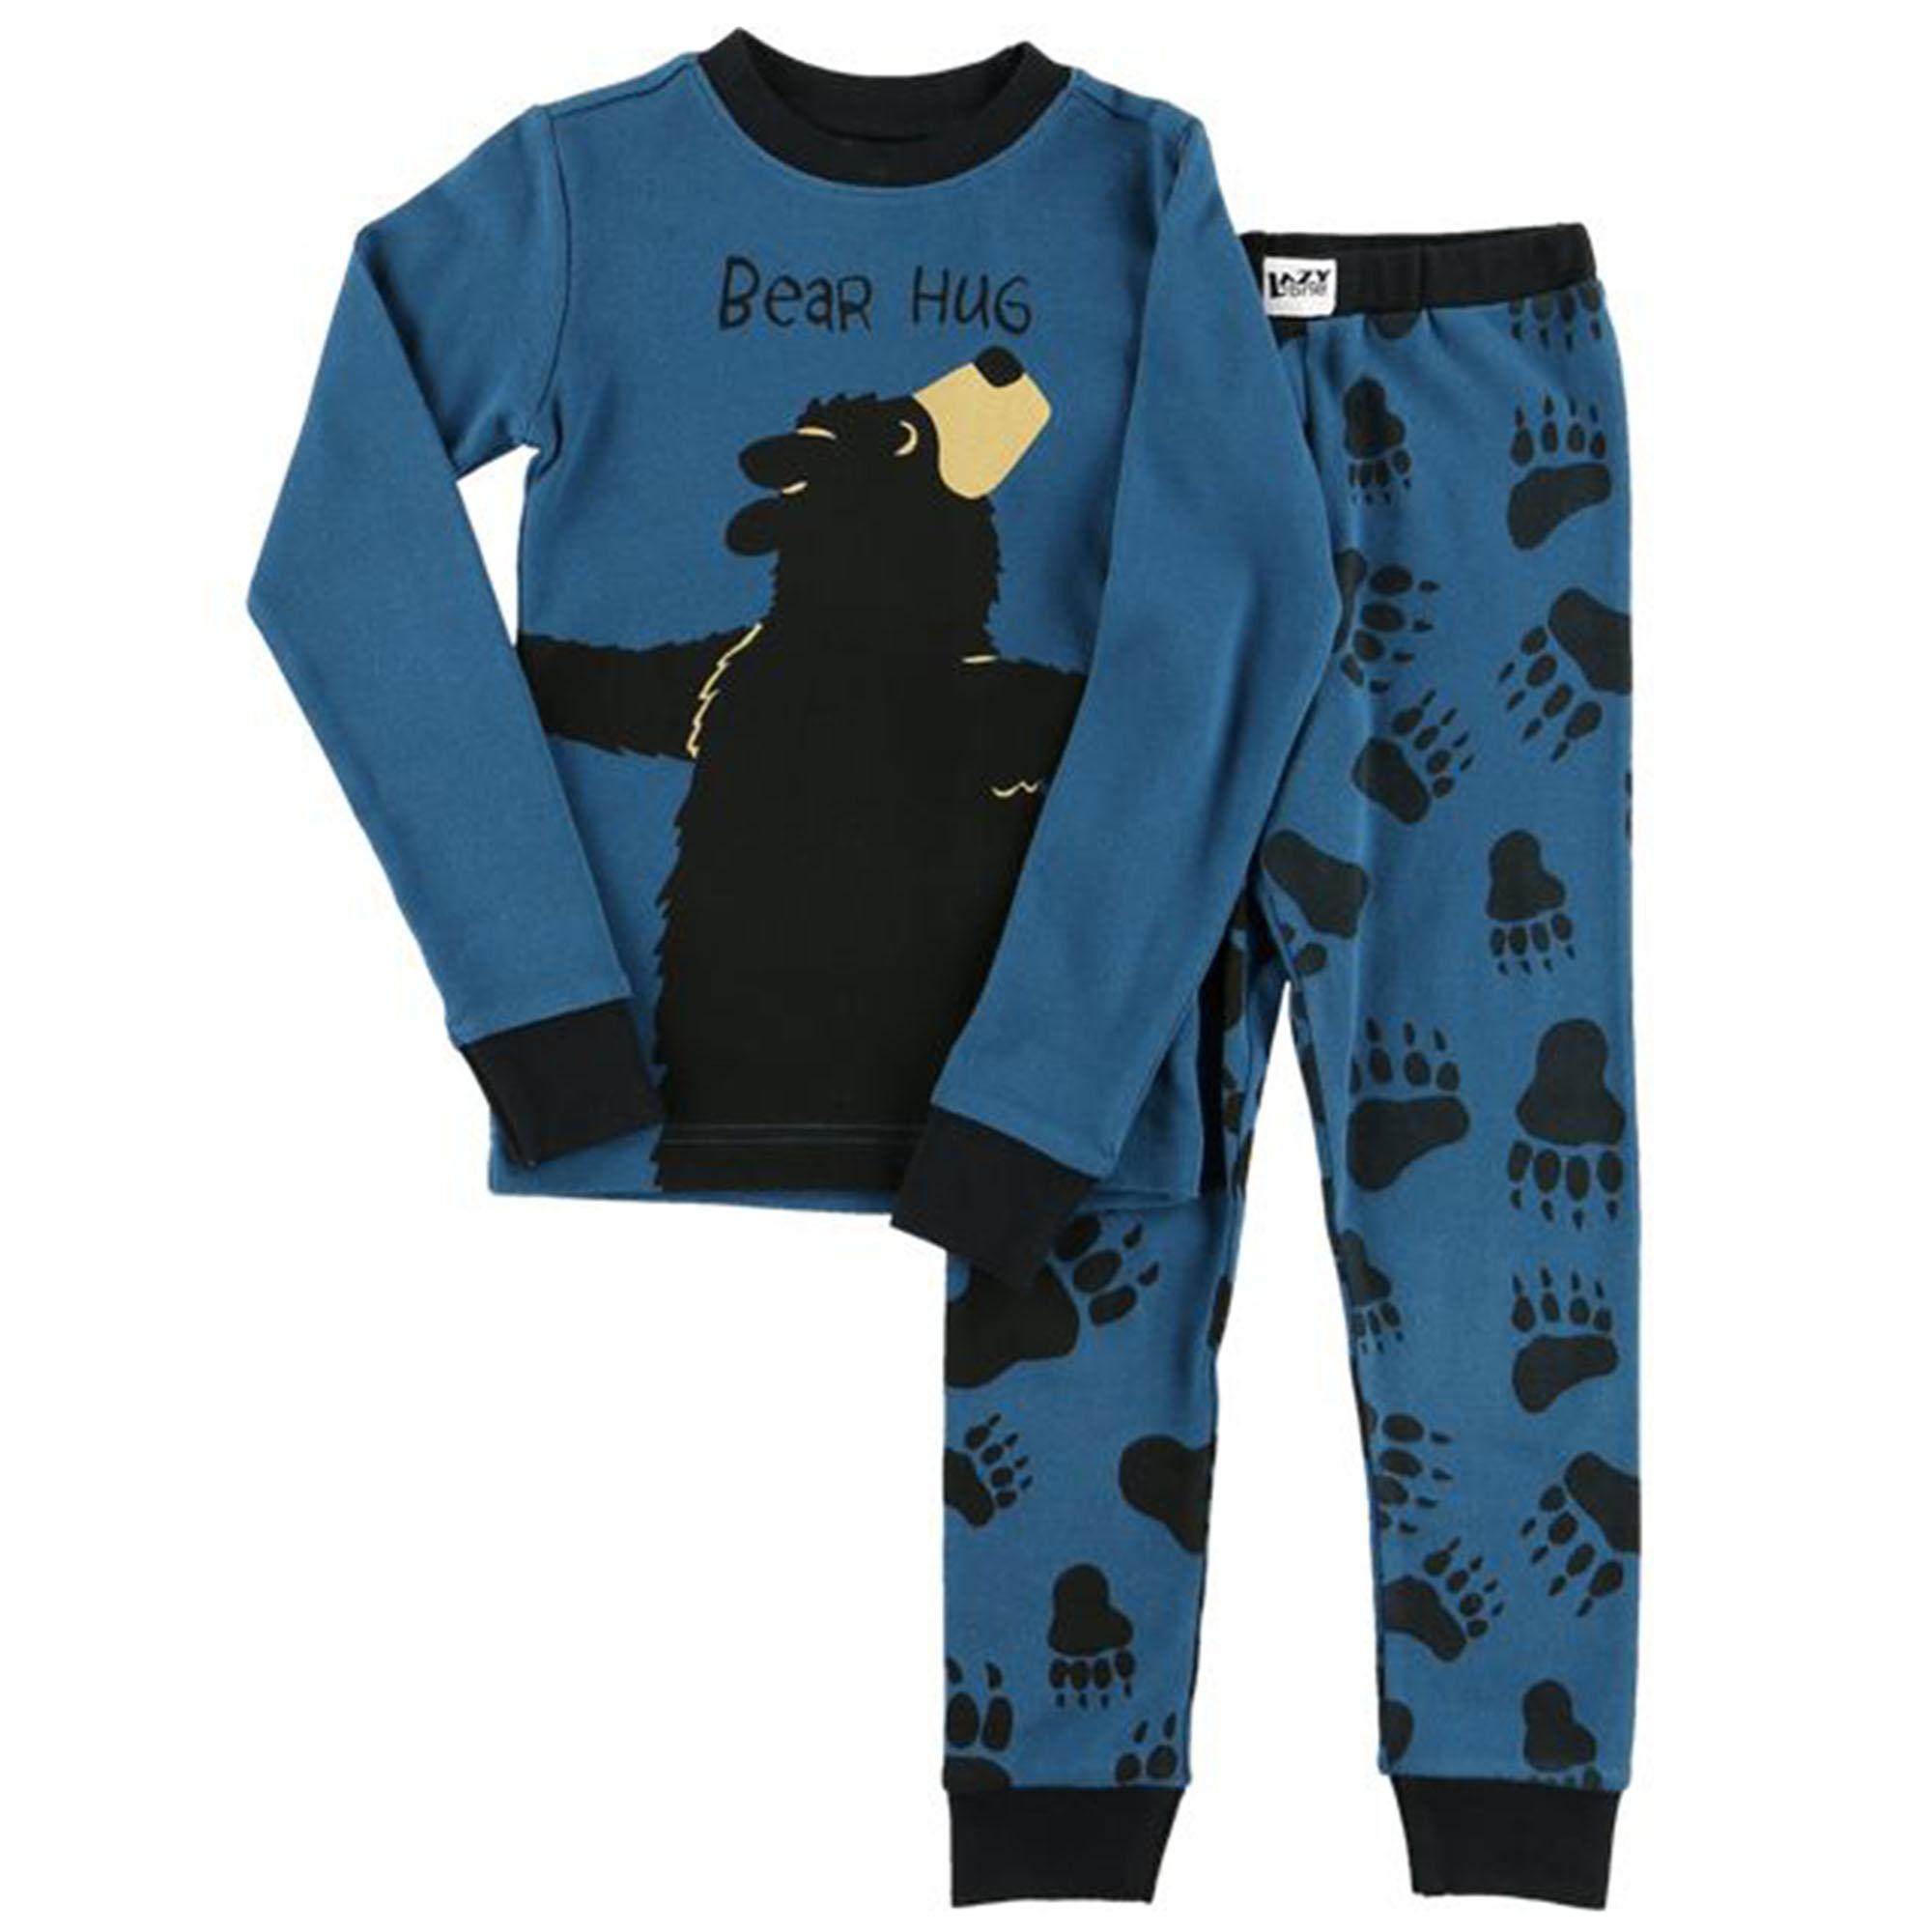 Lazy One Kids Children PJ Pajamas Sleepwear Toddler Blue Brown Black Duck Moose